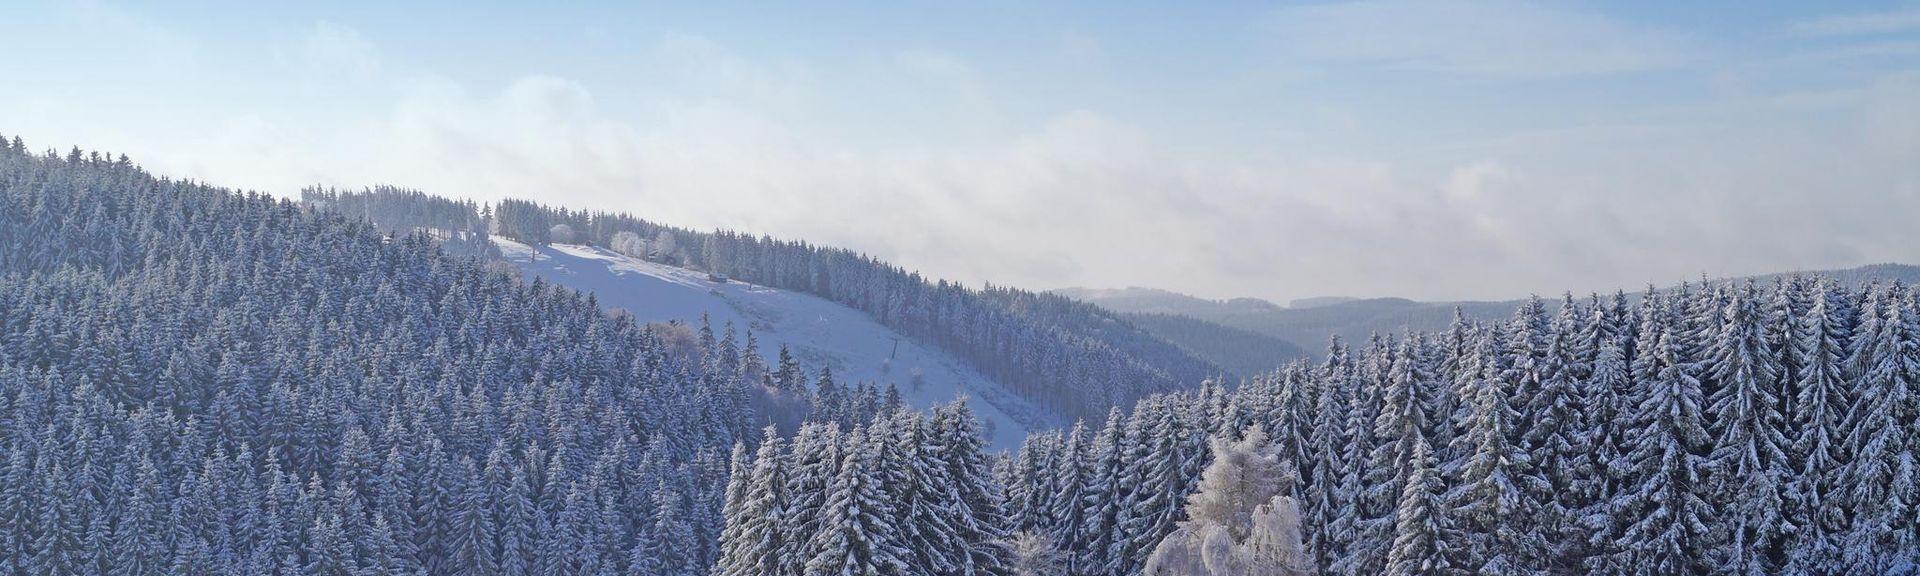 Bad Lauterberg im Harz, Basse-Saxe, Allemagne